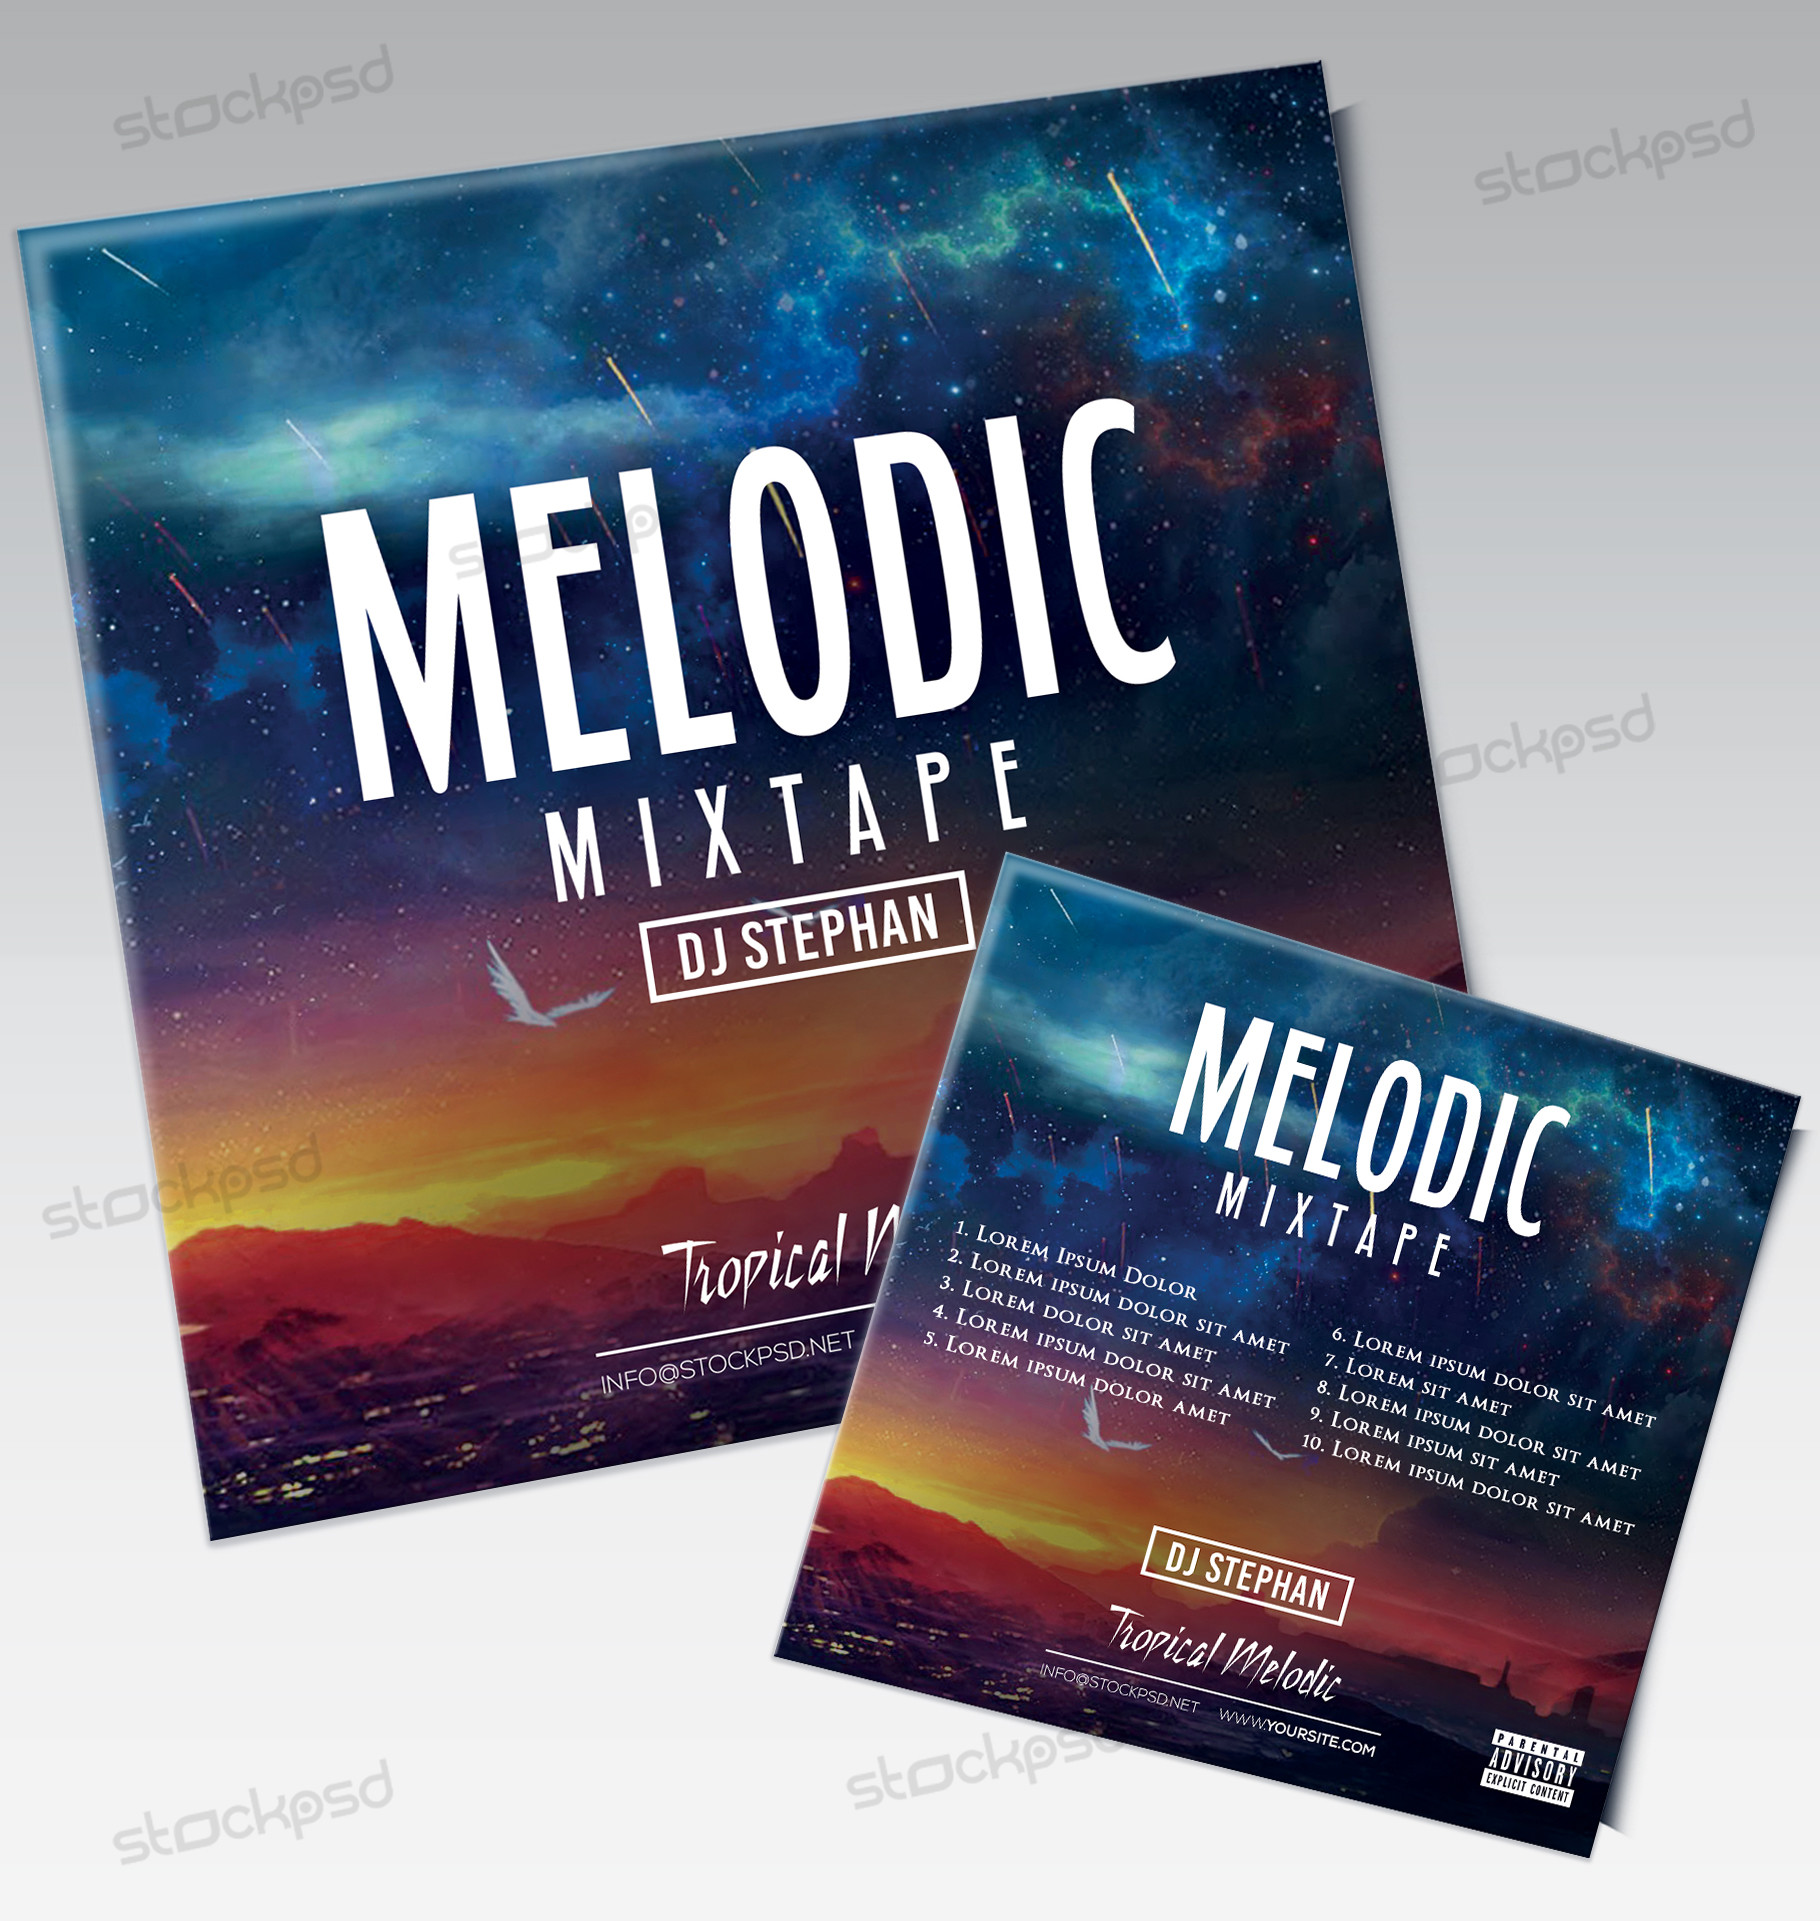 Free Mixtape & Album Art | Freebie PSD Templates - Stockpsd net